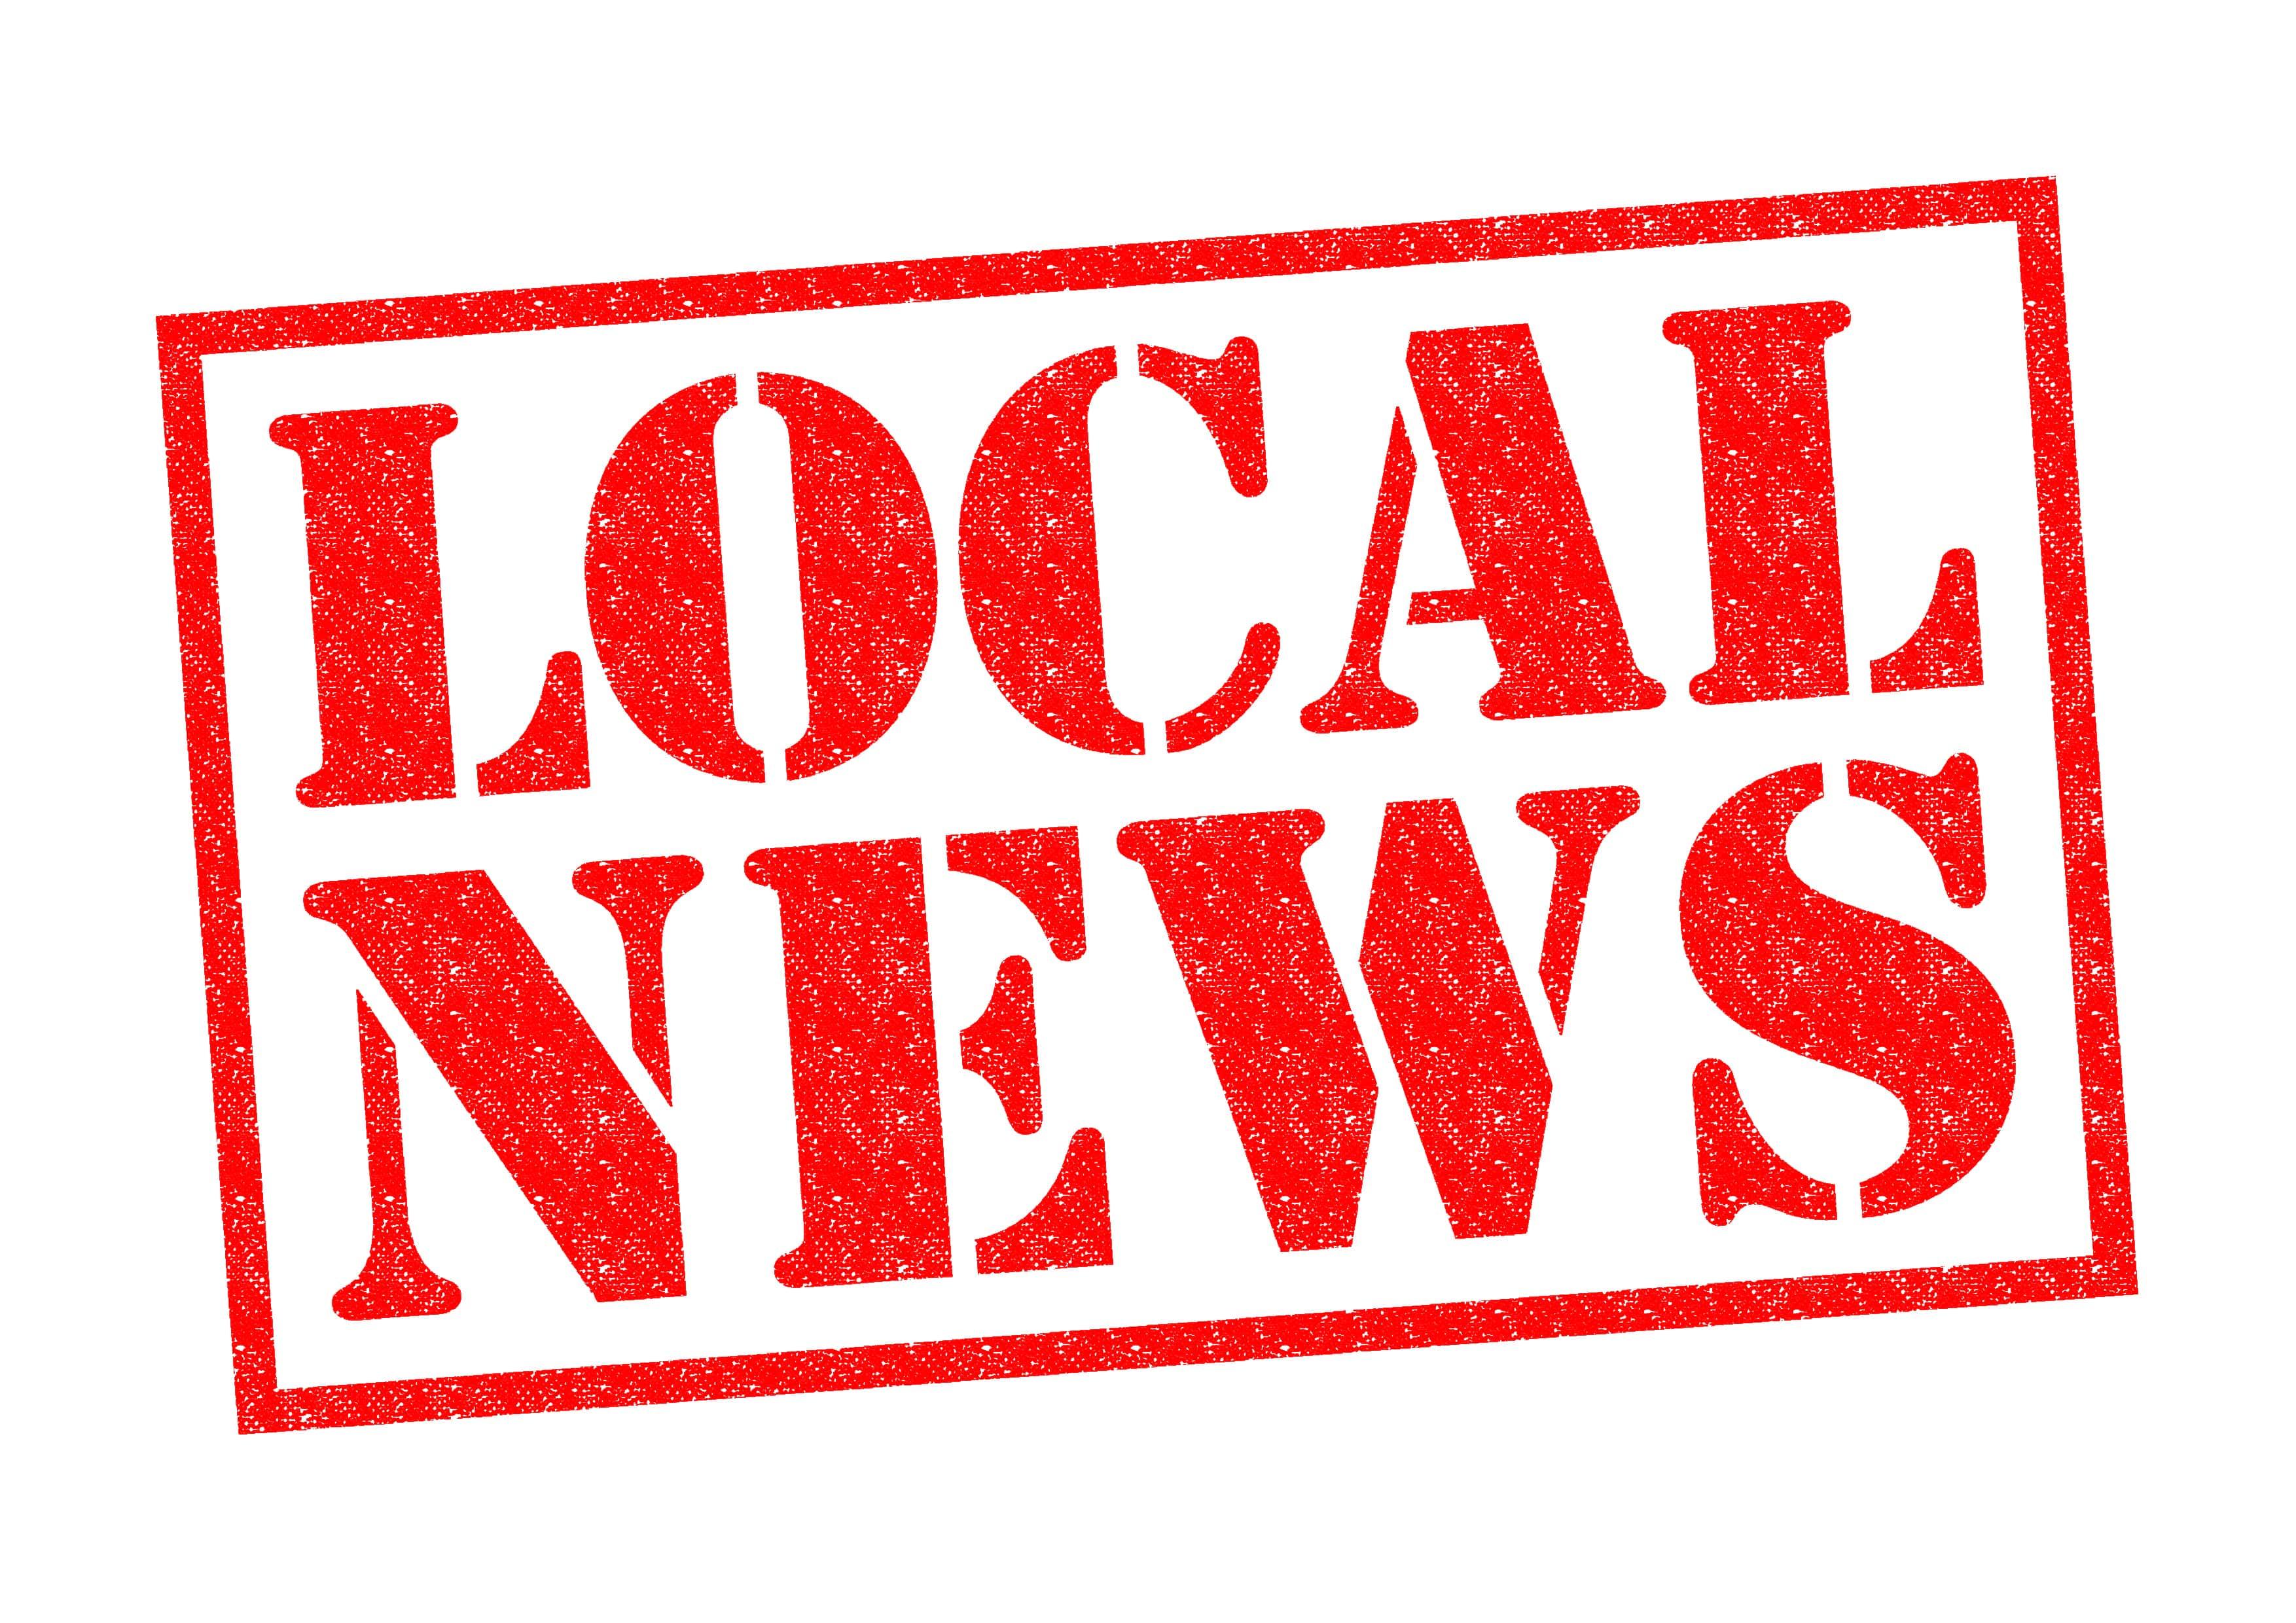 Johnston City Council appoints interim mayor | 101 5 CIL-FM